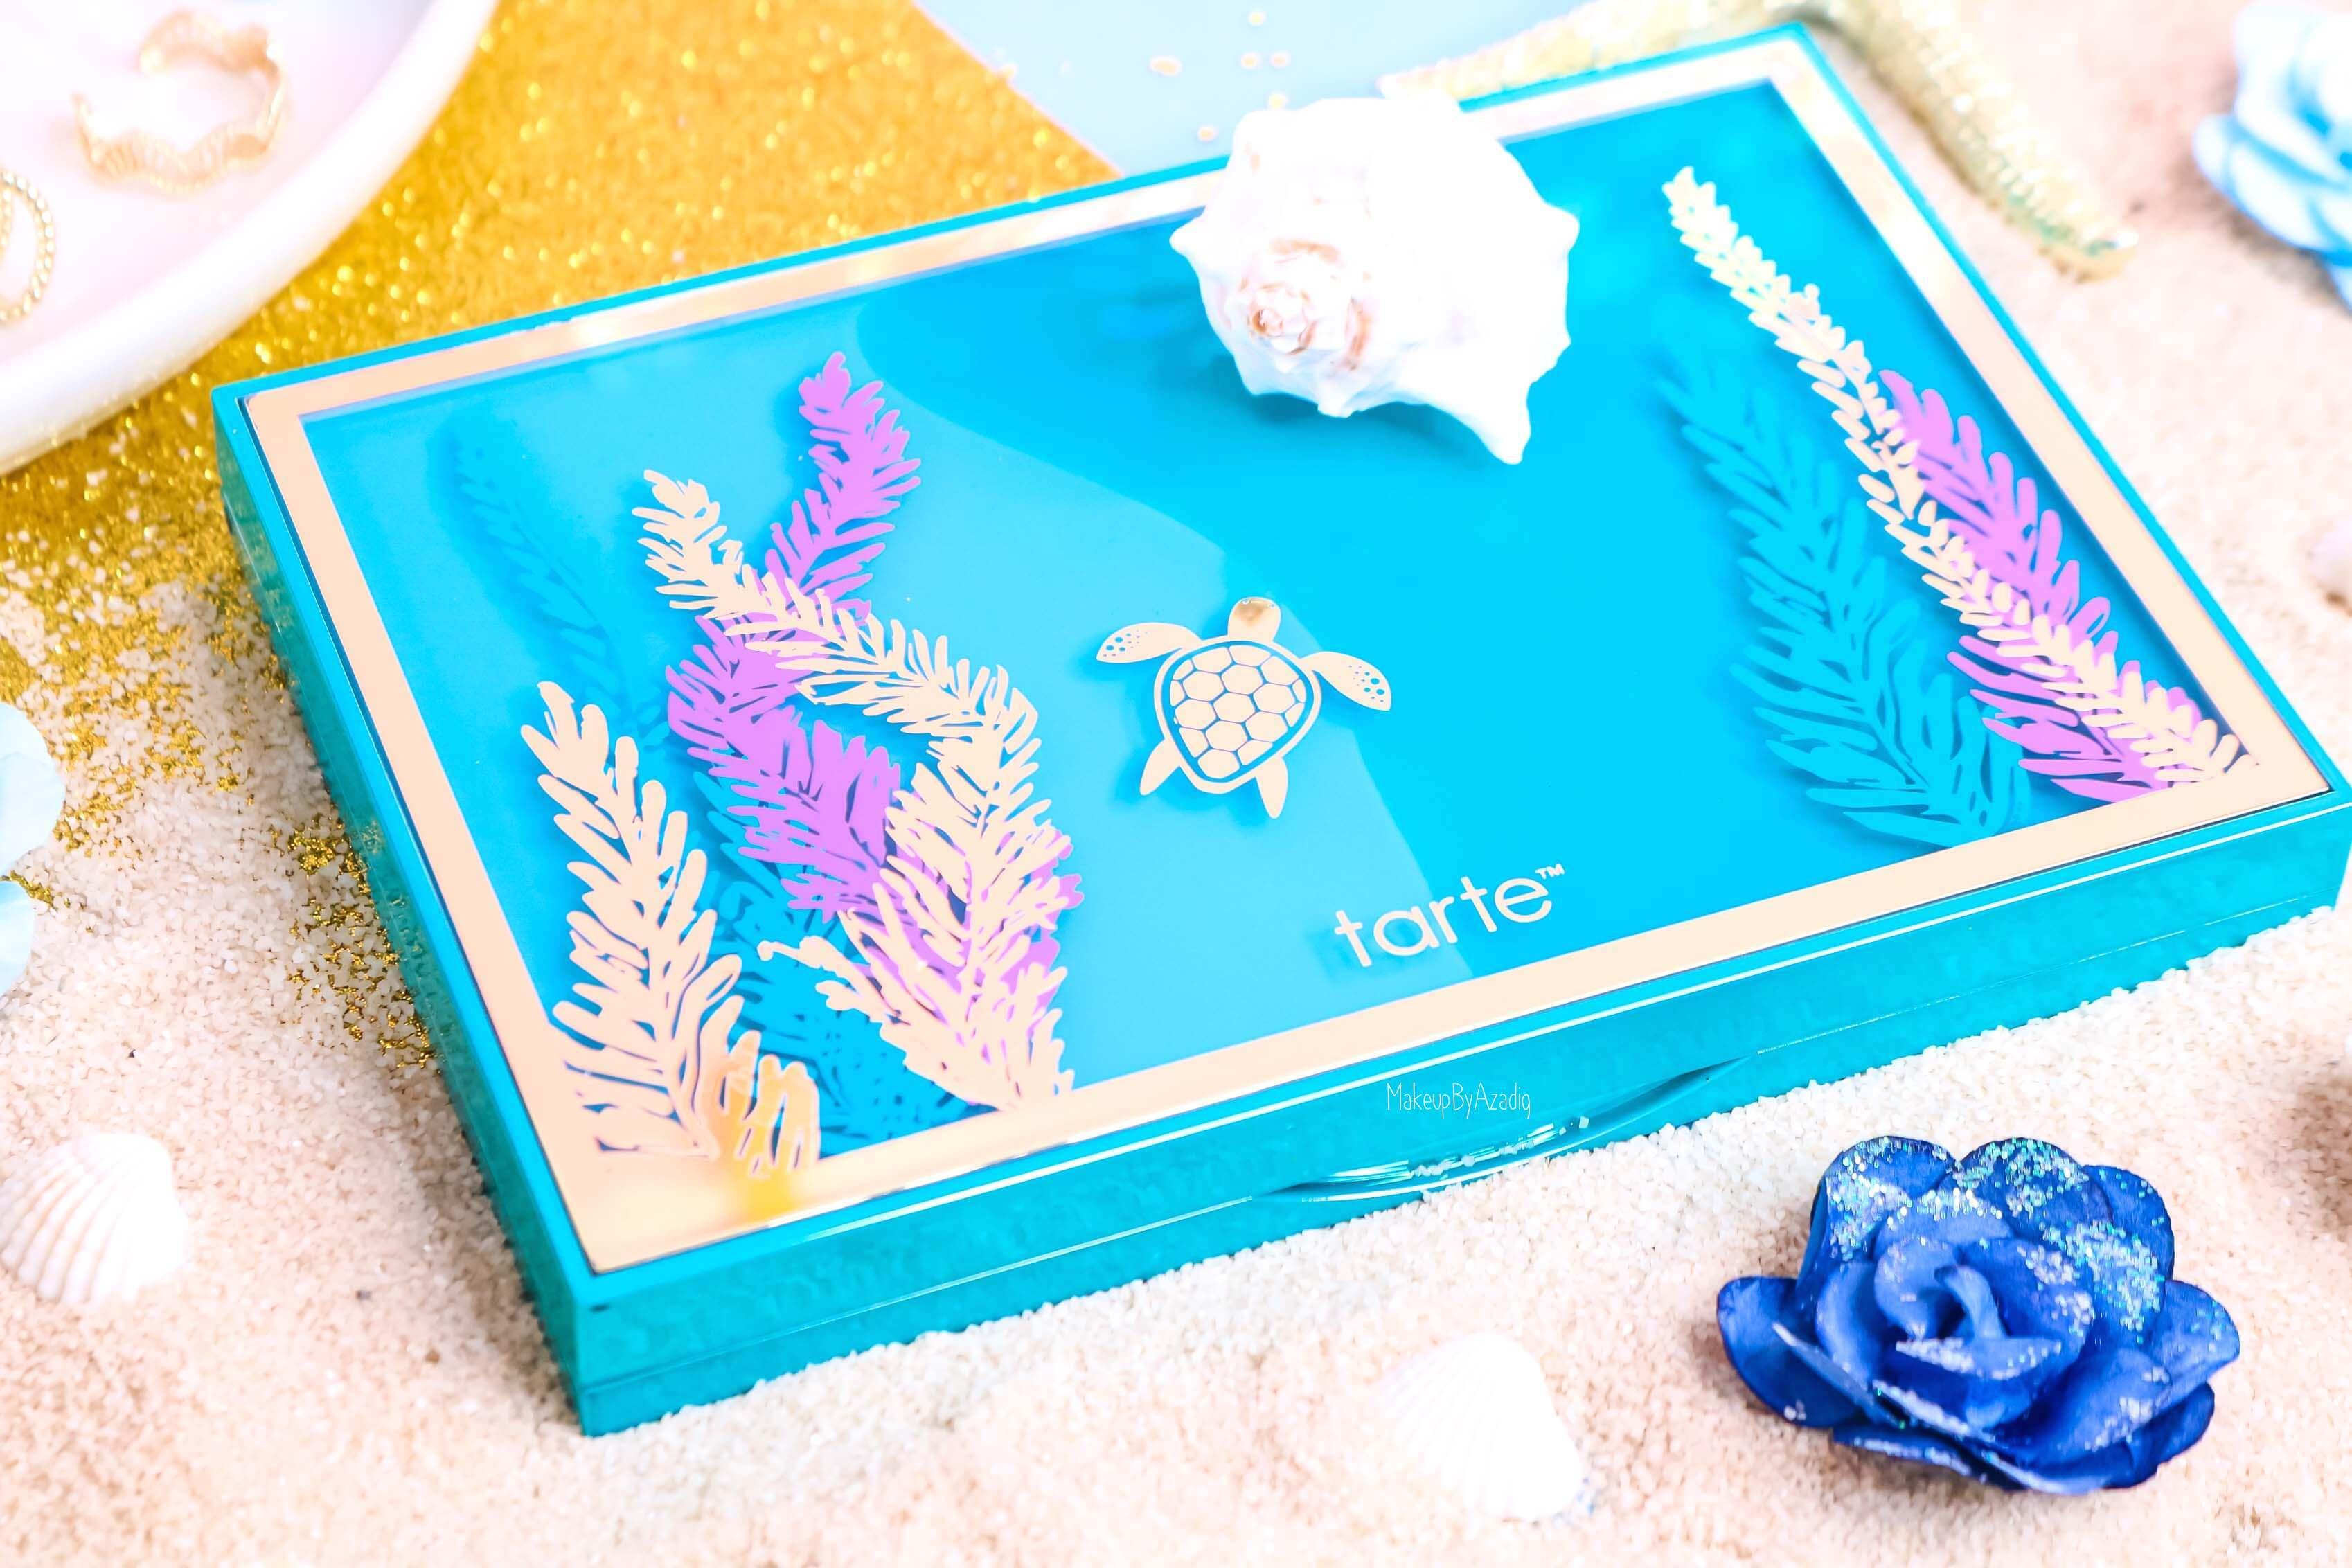 revue-palette-tarte-cosmetics-france-sephora-makeupbyazadig-swatch-prix-avis-rainforest-of-the-sea-eyes